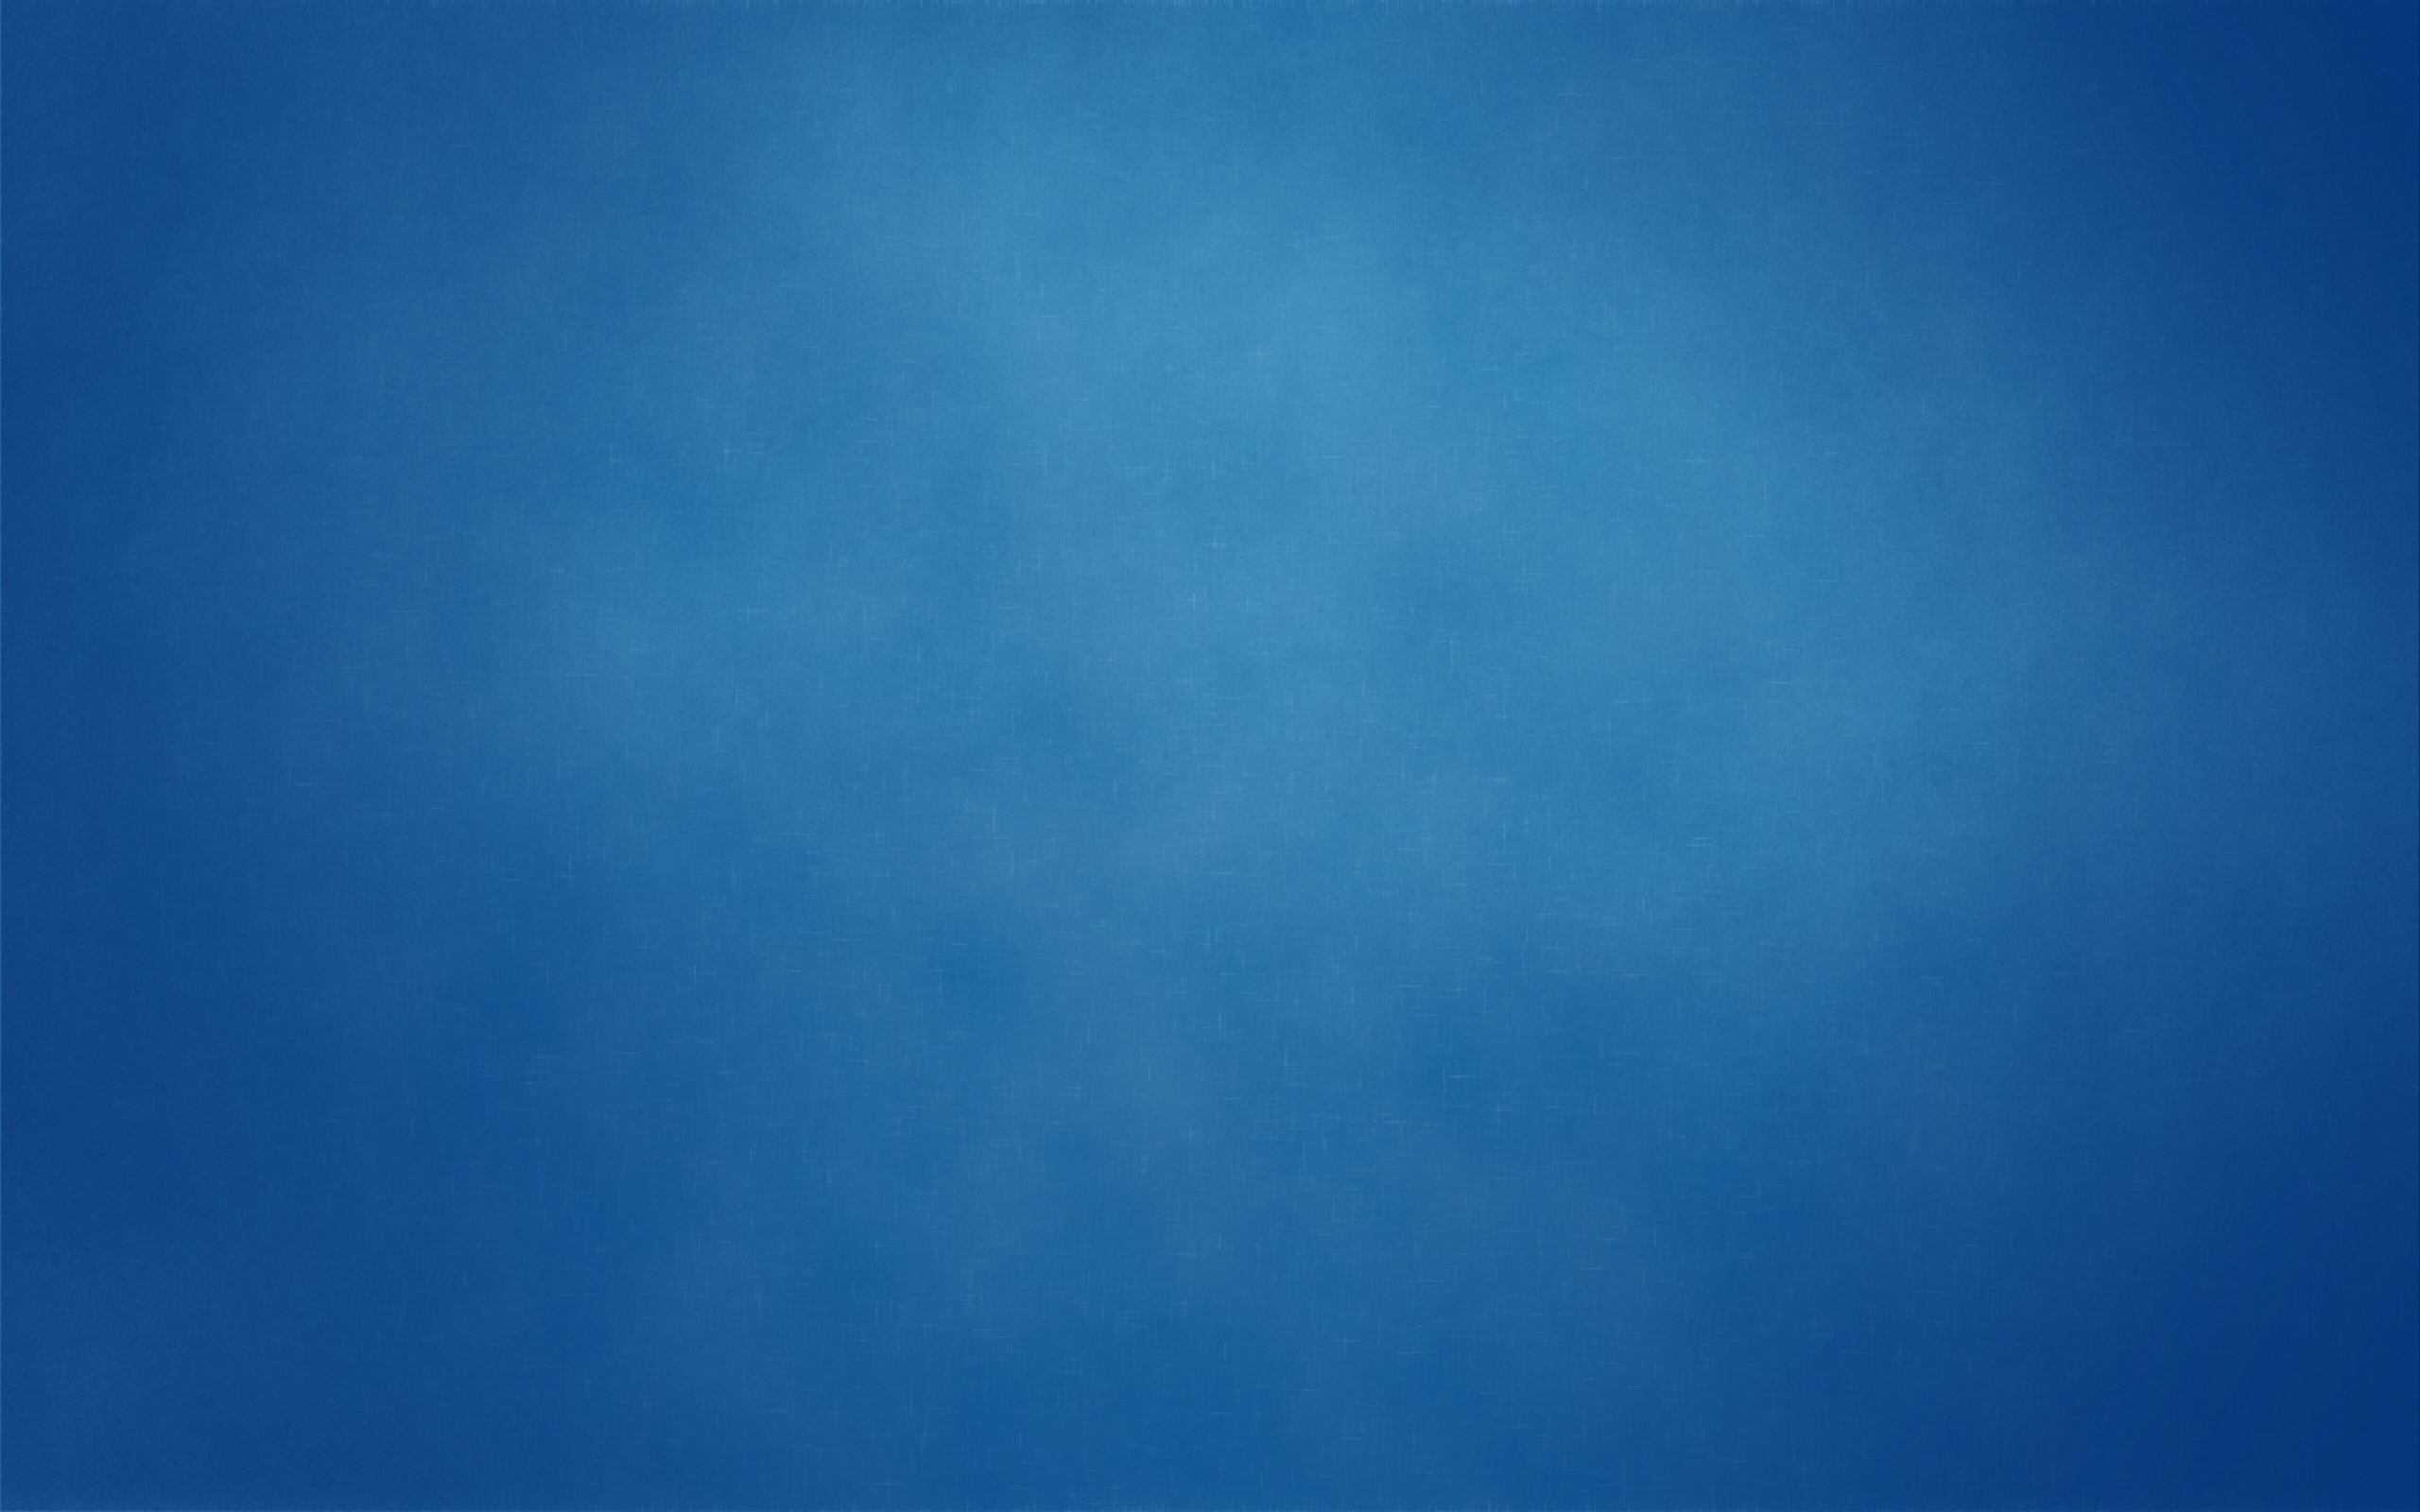 Navy Blue Wallpaper Background Wallpaper 2560x1600